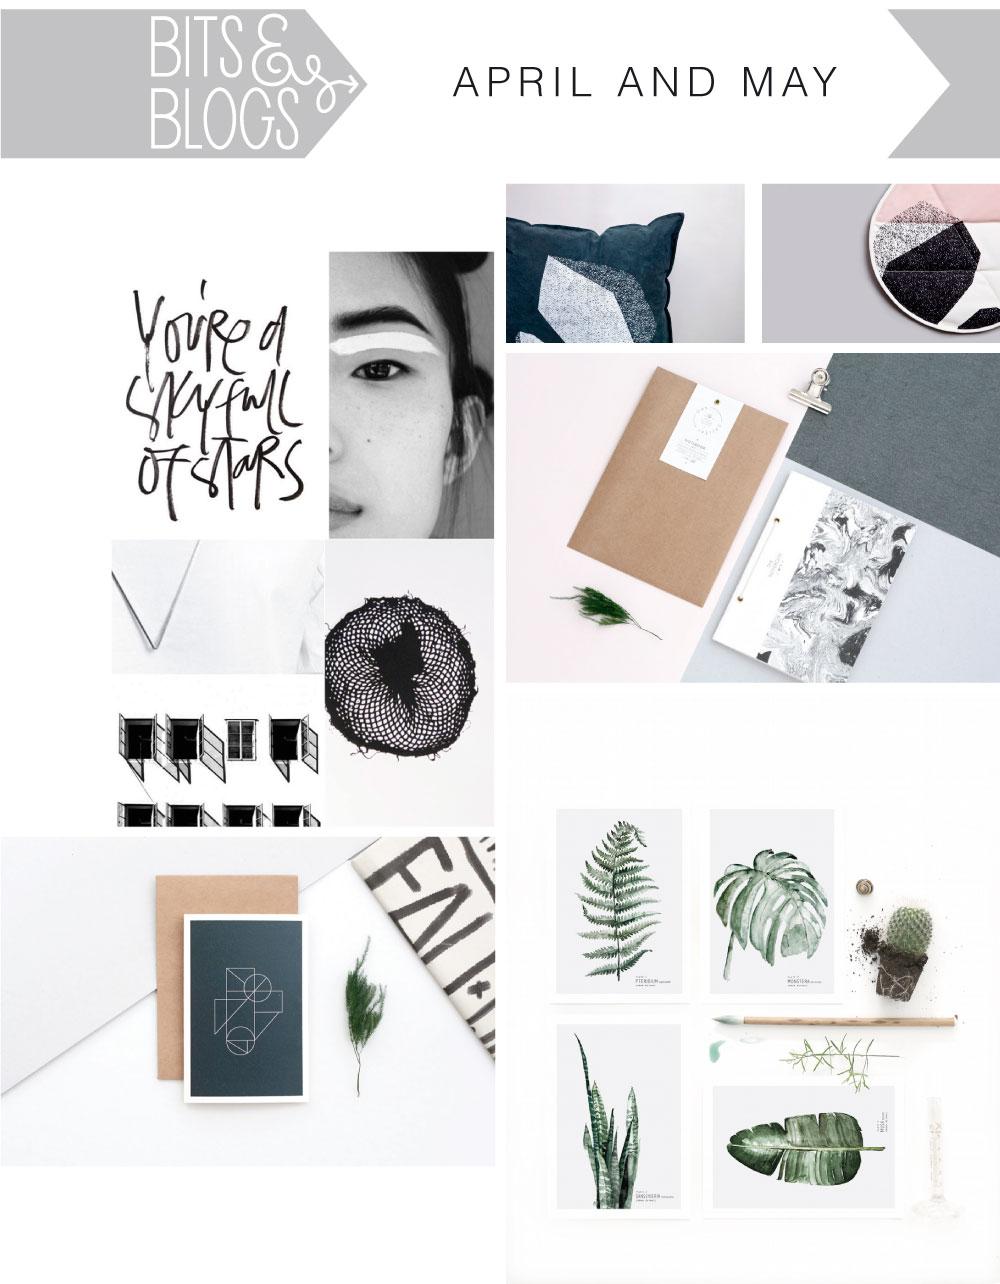 Image - April and May